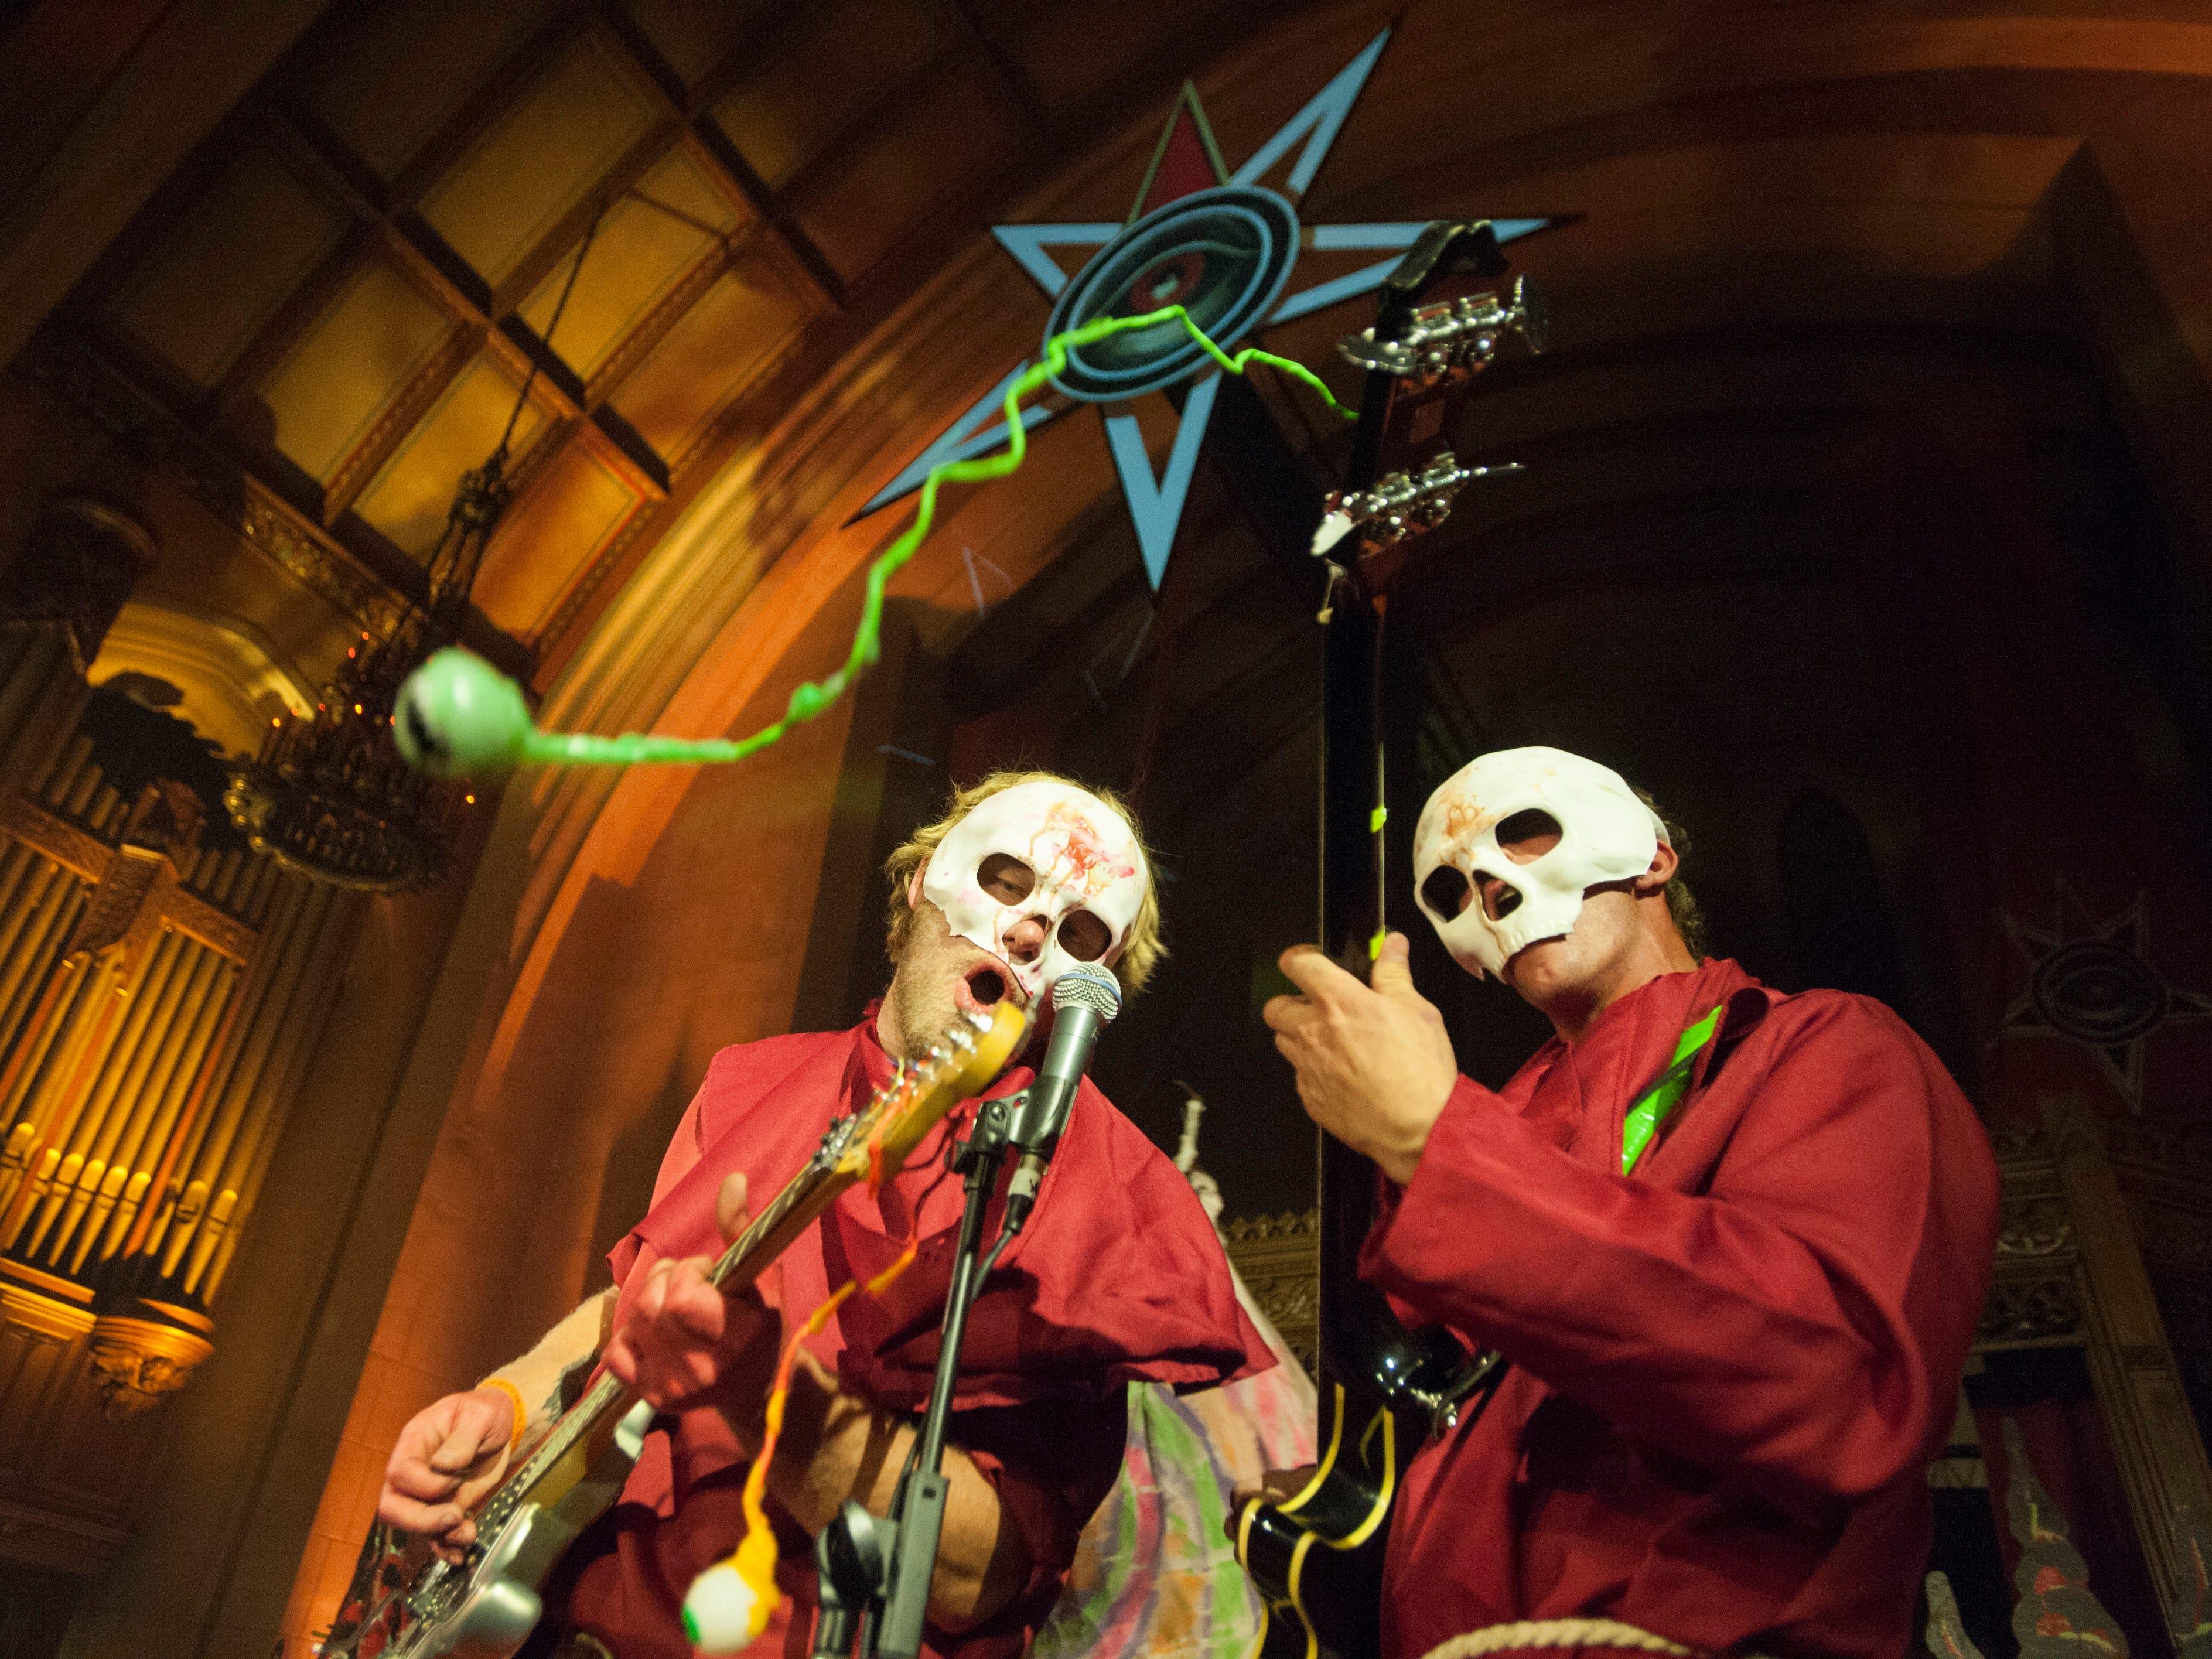 Theatrical rockers Krillin vs. Spaceskull perform on 'The Asylum' stage.